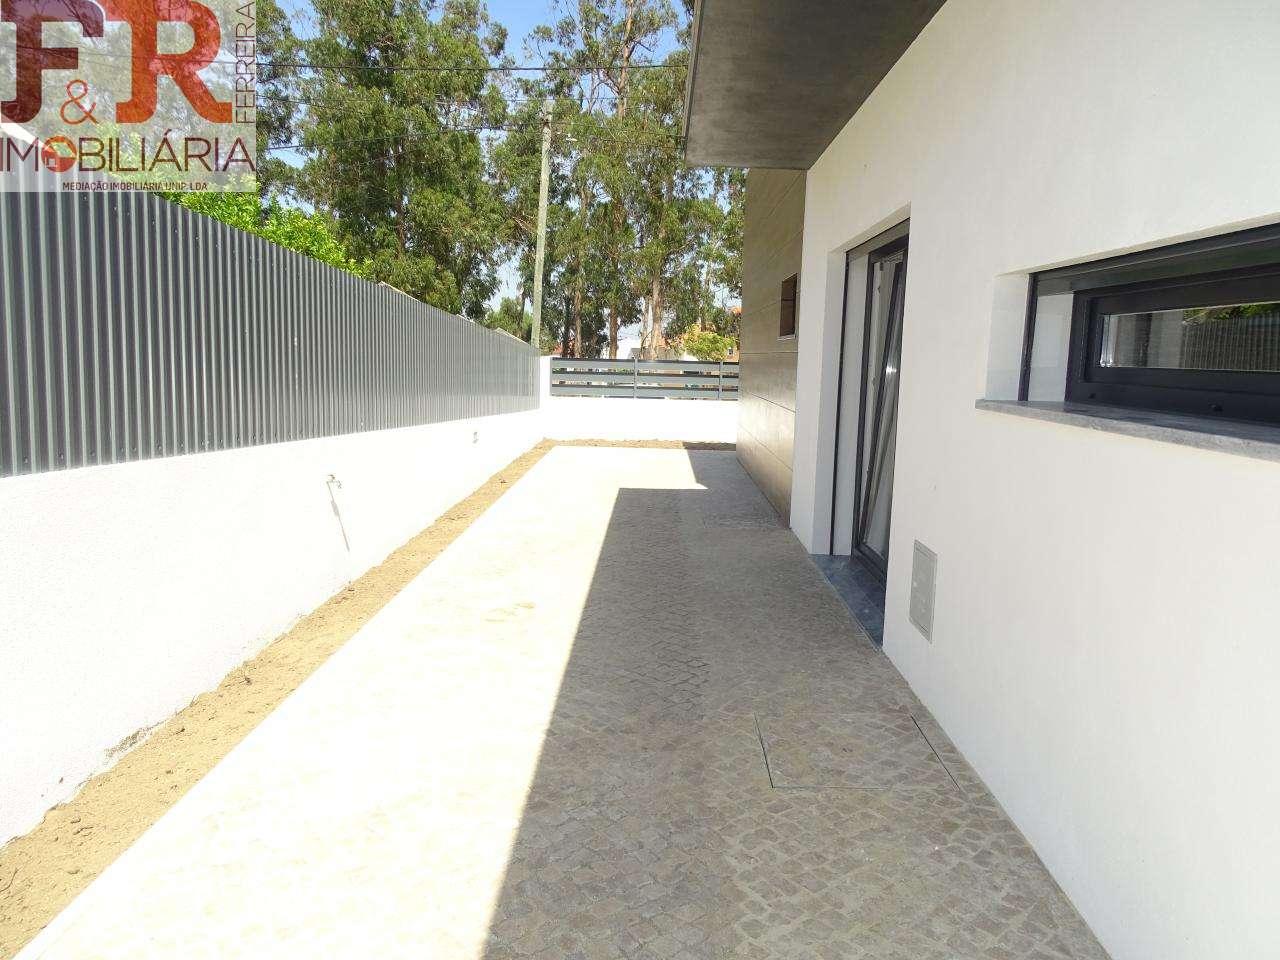 Moradia para comprar, Quinta do Conde, Setúbal - Foto 30